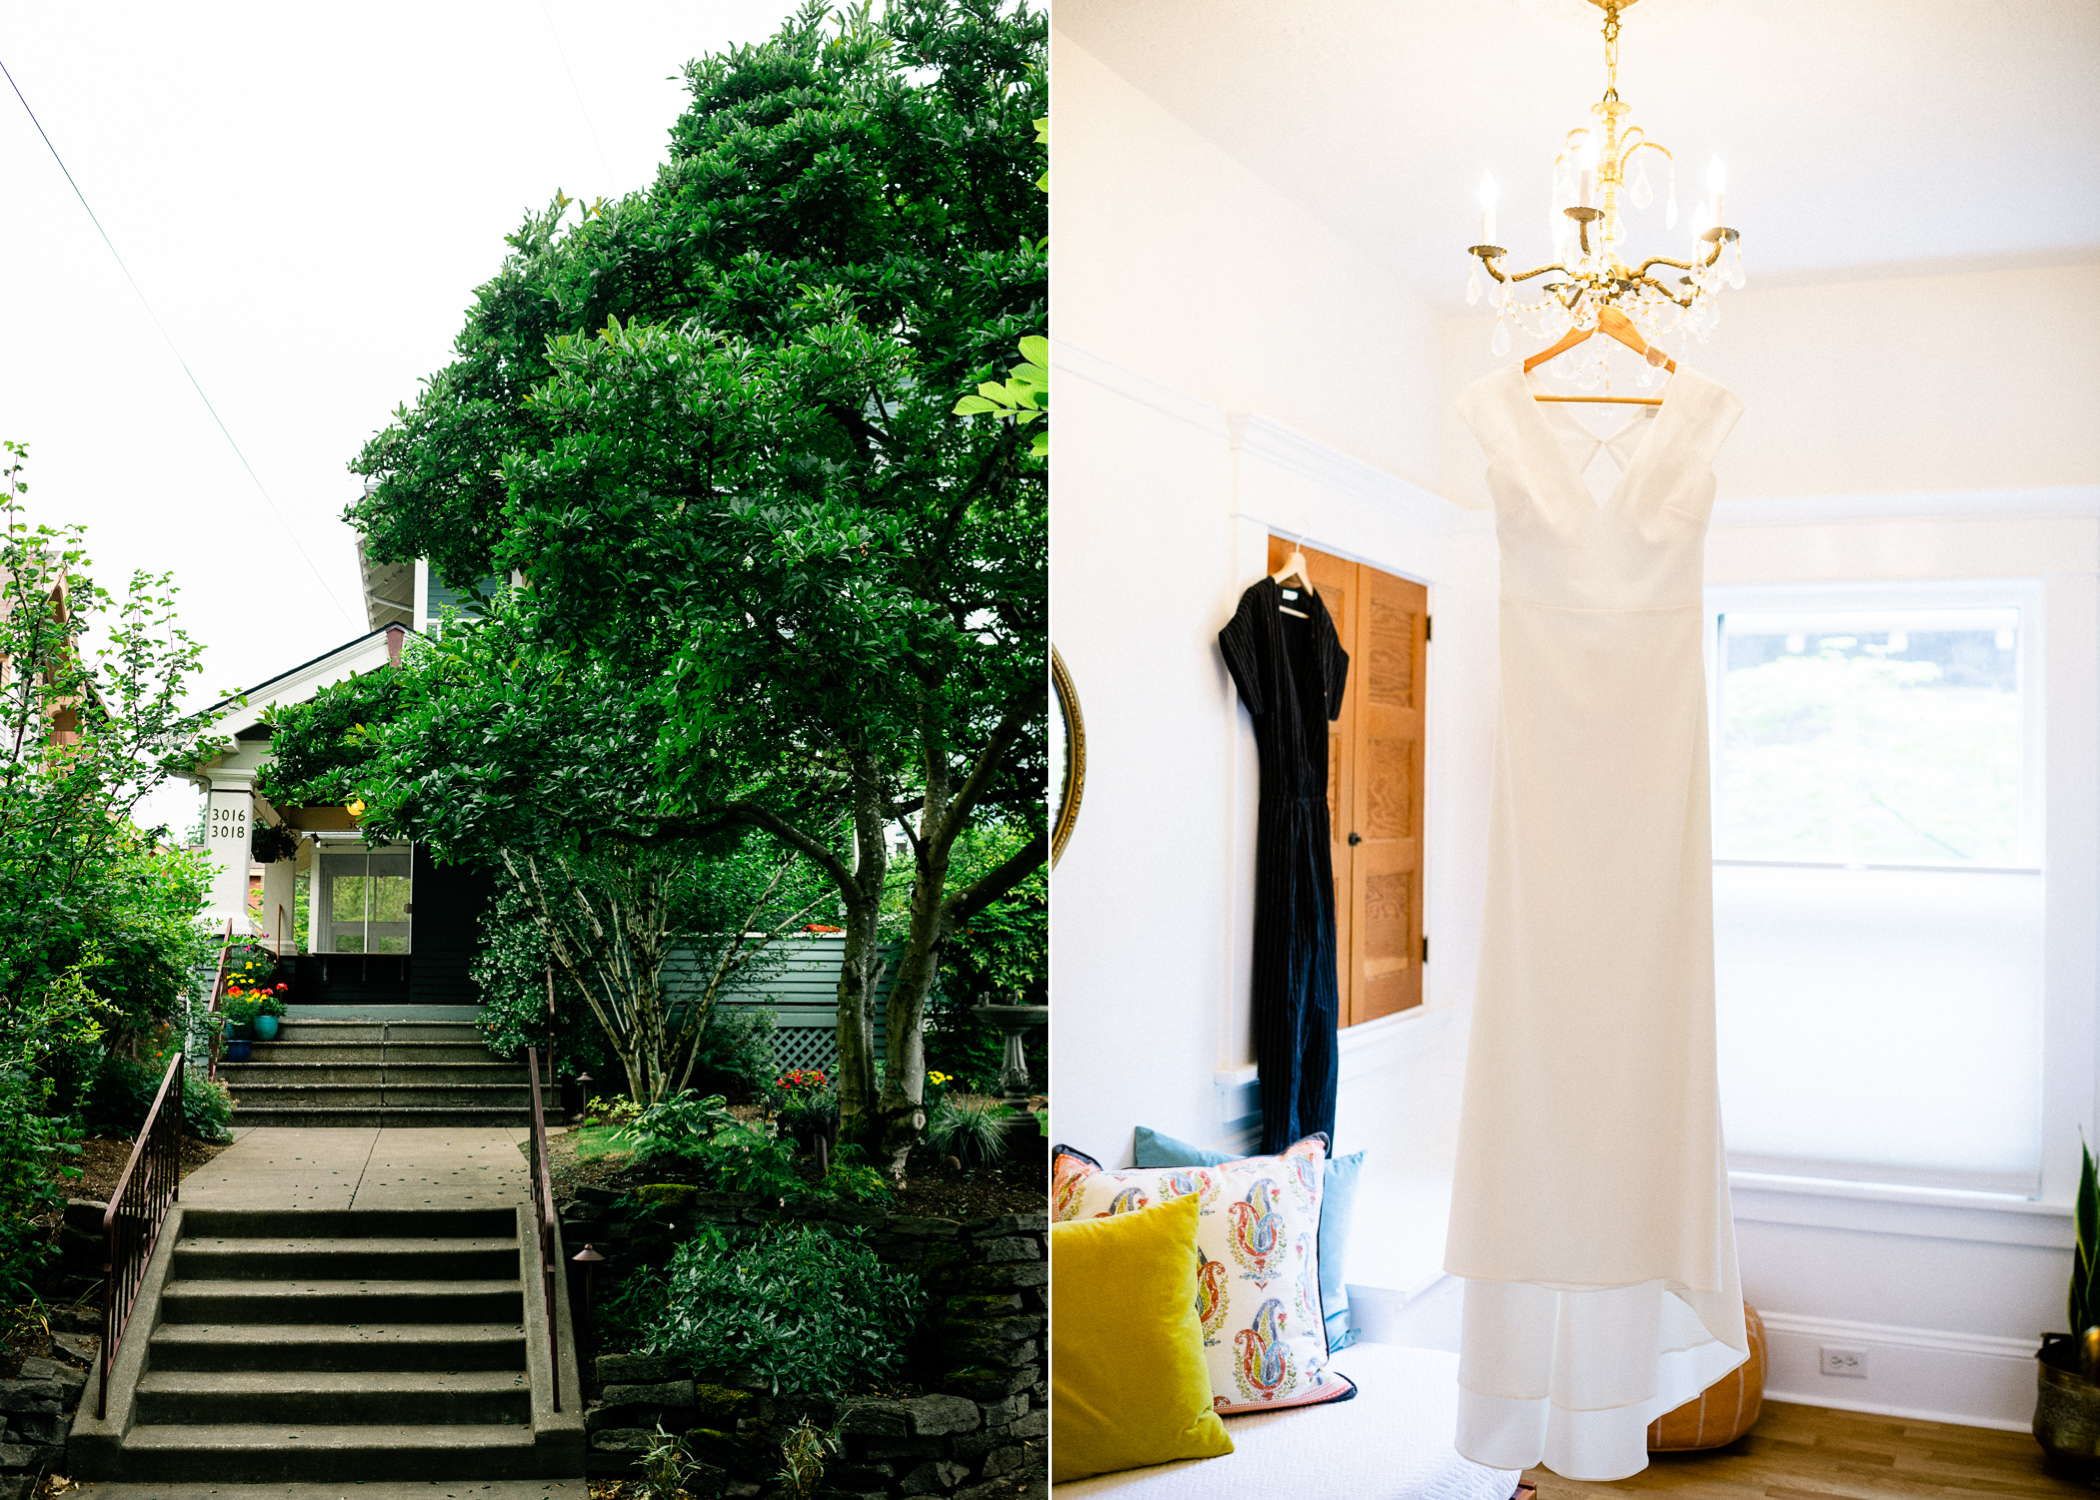 cathedral-park-portland-elopement-gay-wedding-001.JPG